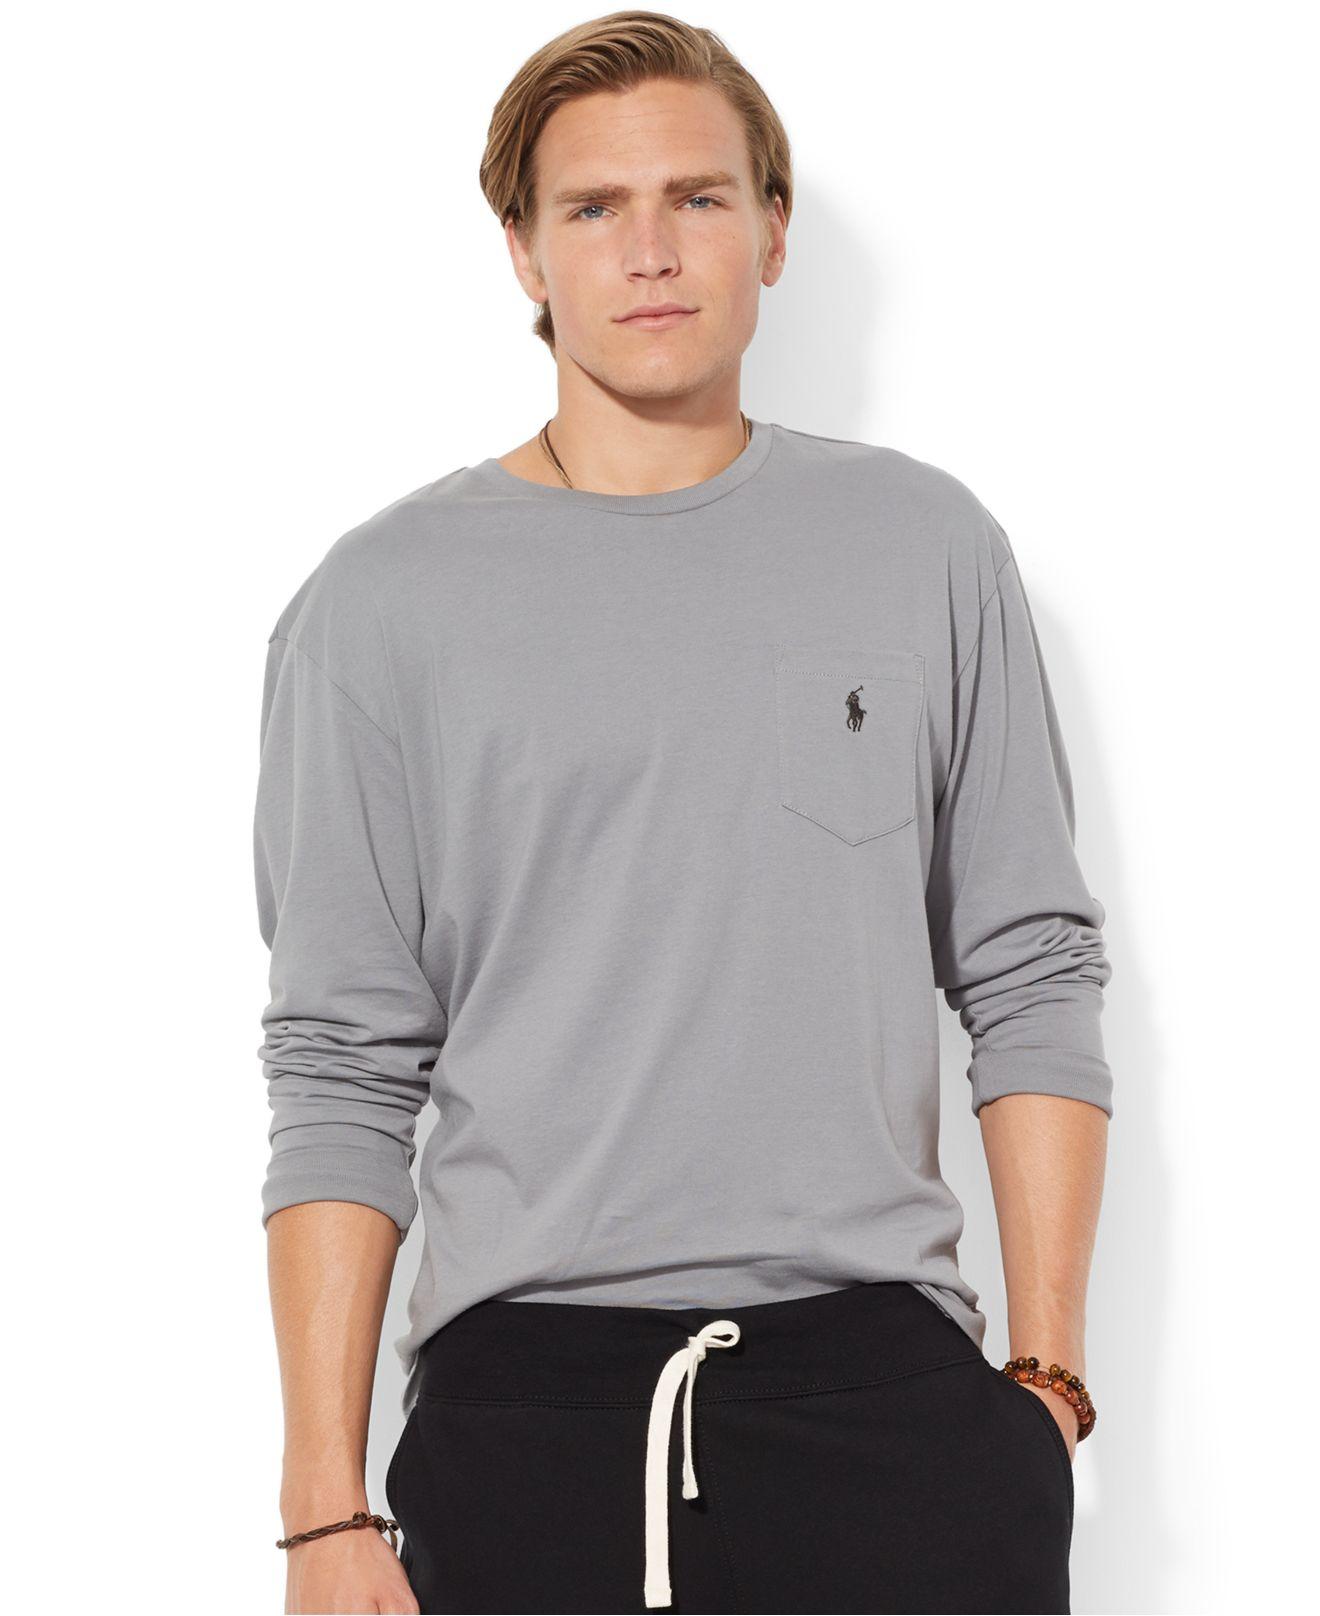 polo ralph lauren classic fit long sleeved jersey pocket. Black Bedroom Furniture Sets. Home Design Ideas